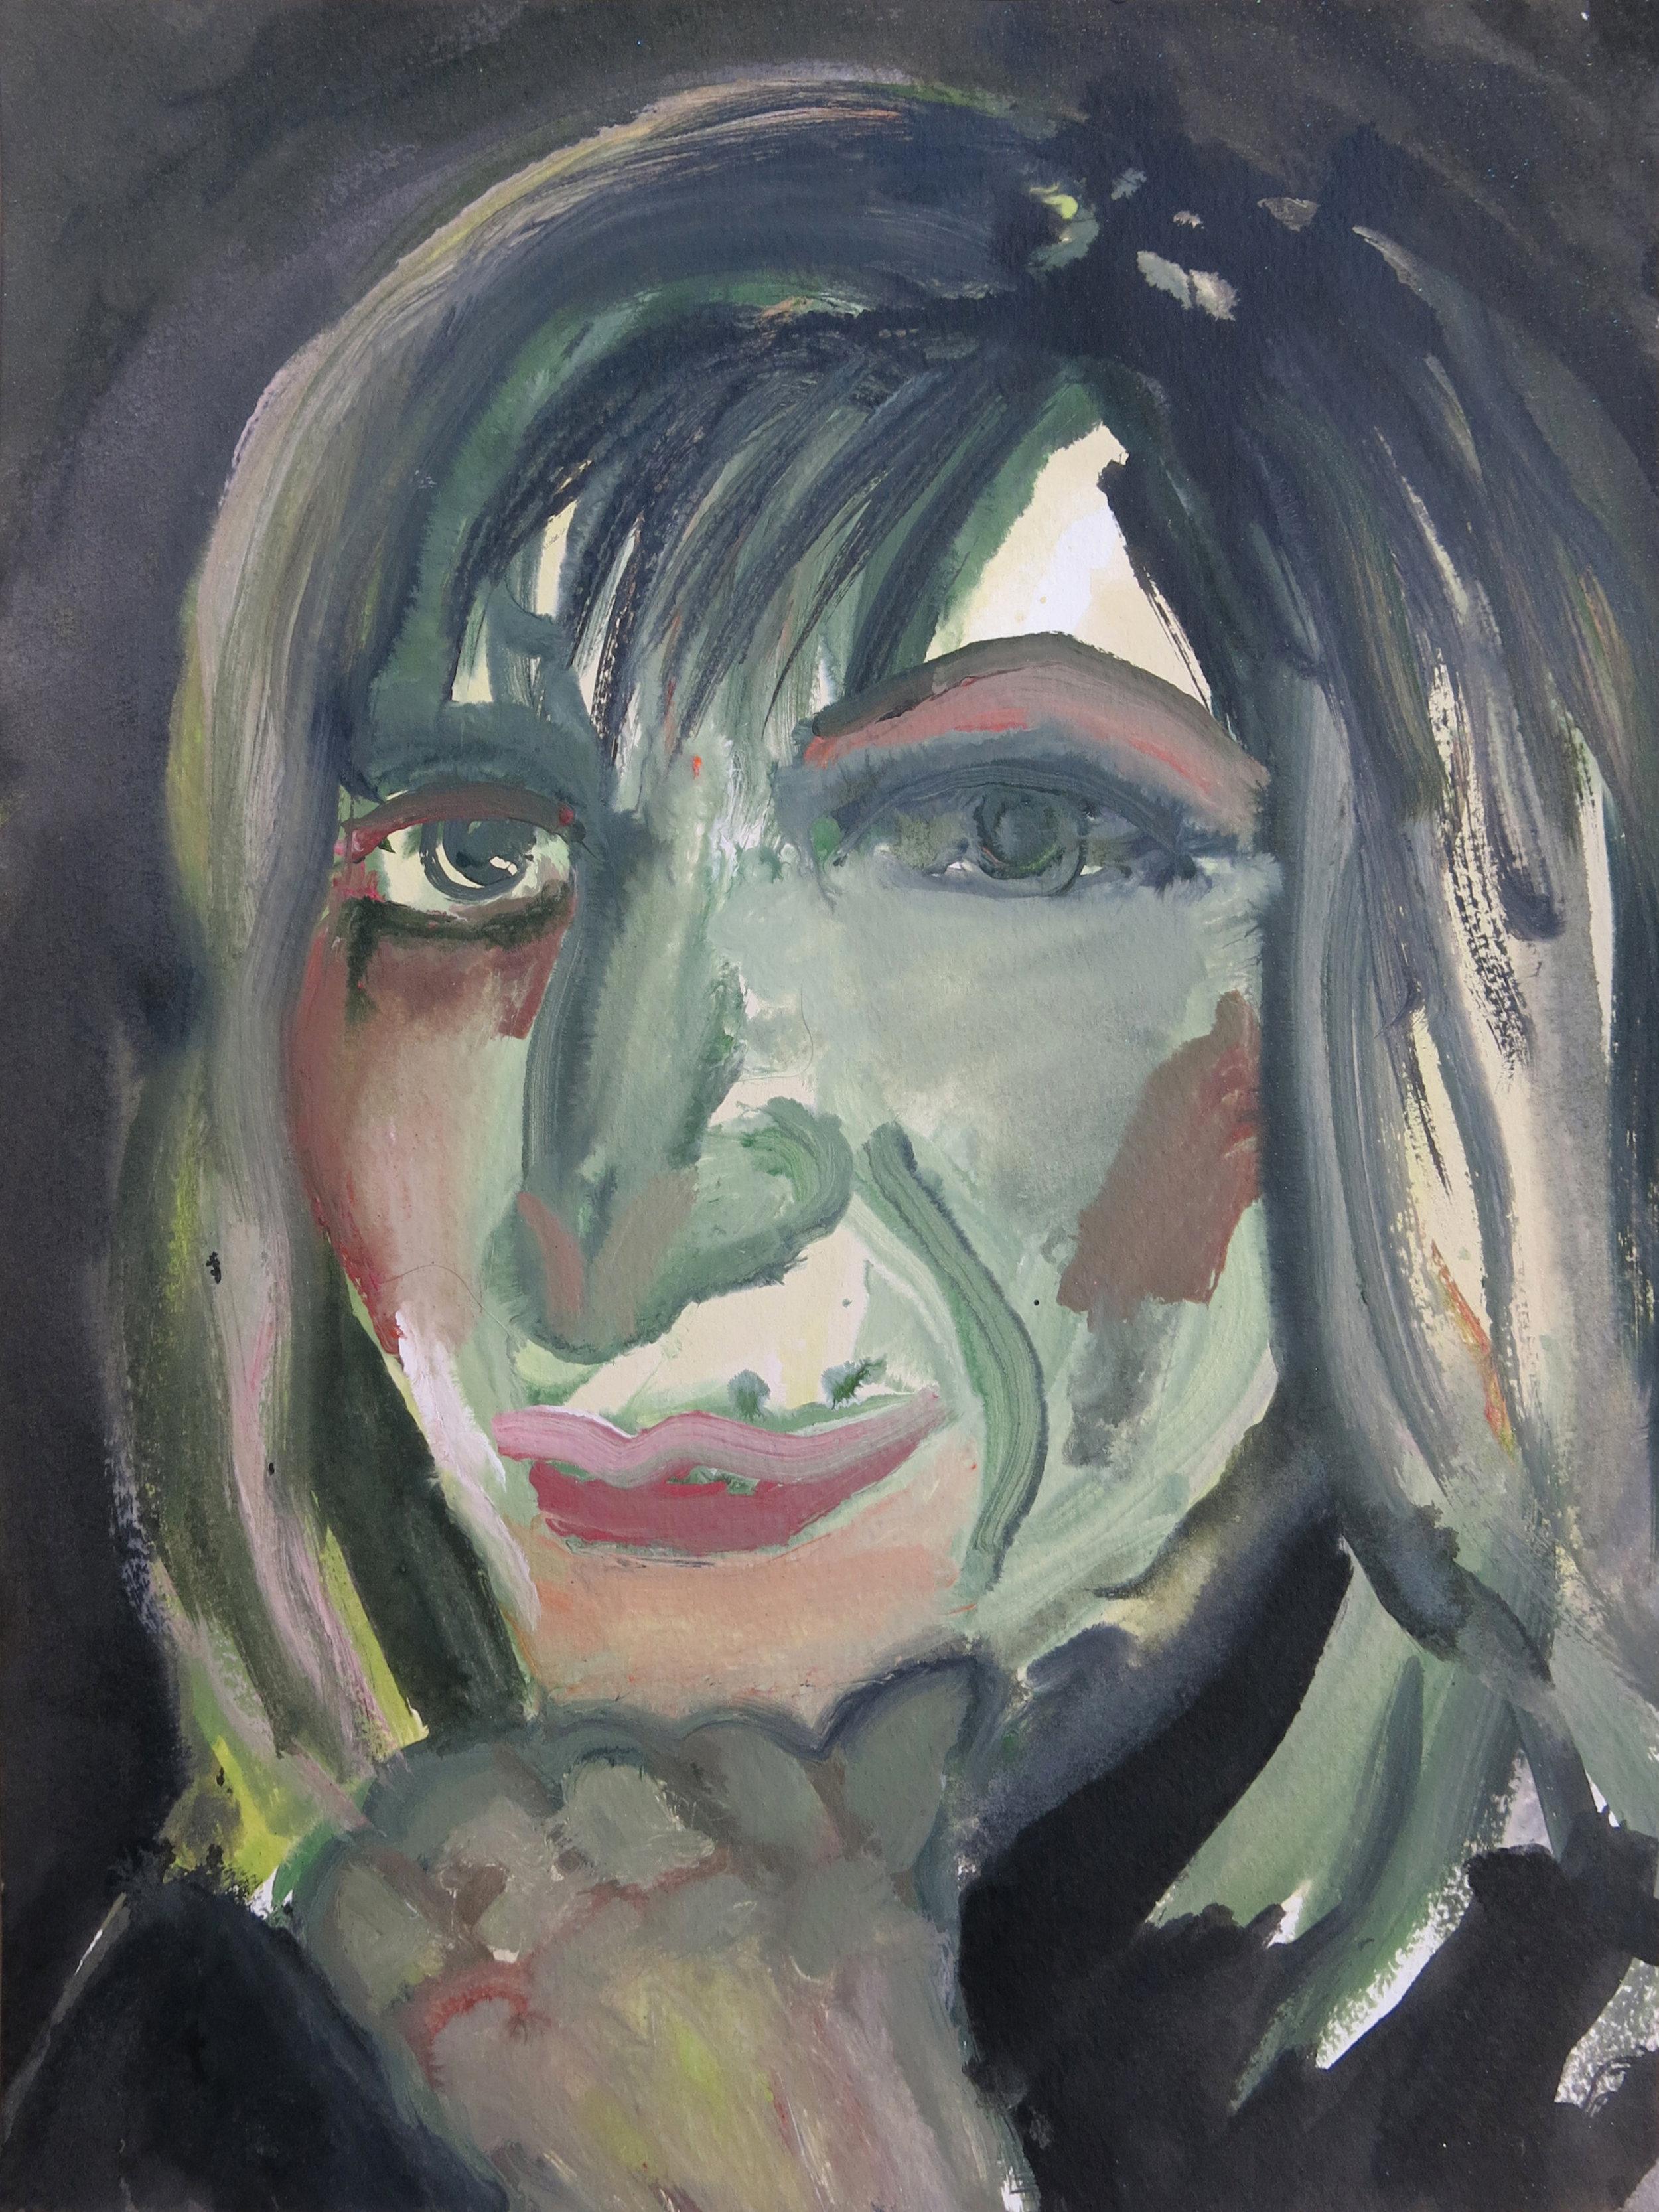 Barbra Streisand Portrait #169